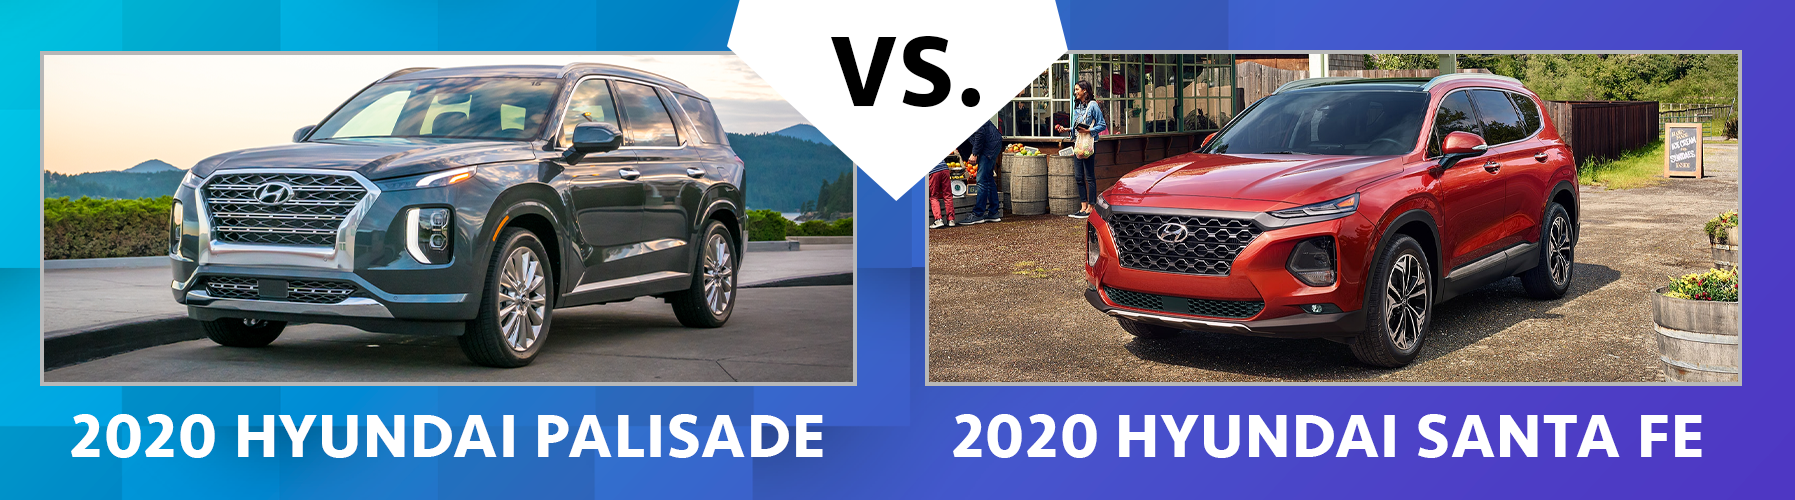 2020 Hyundai Palisade vs 2020 Hyundai Santa Fe Chicago IL